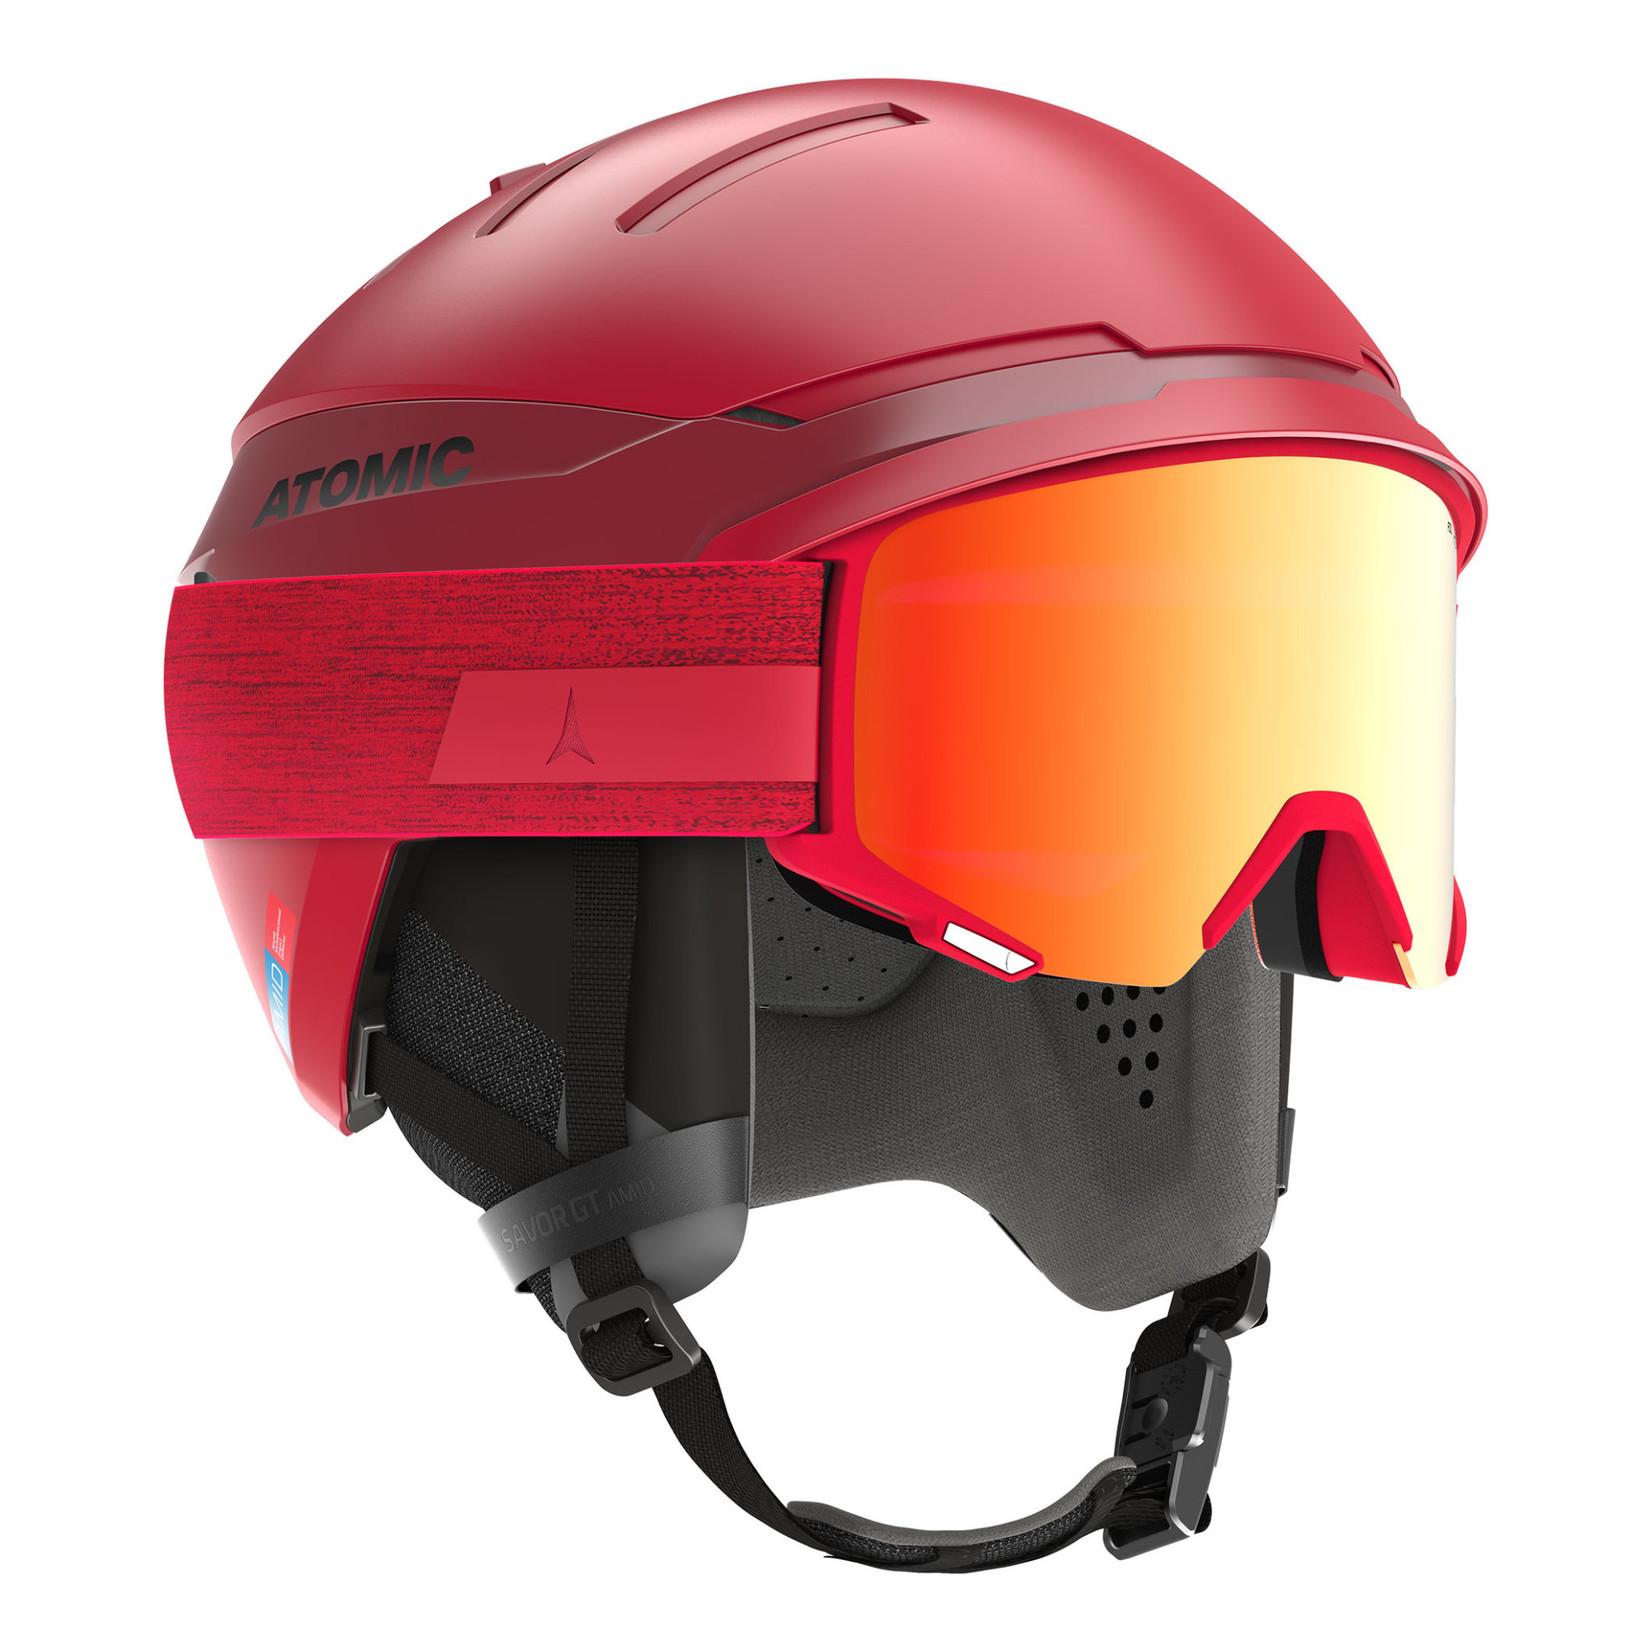 Atomic Casque de ski Atomic Savor GT Amid - Unisexe